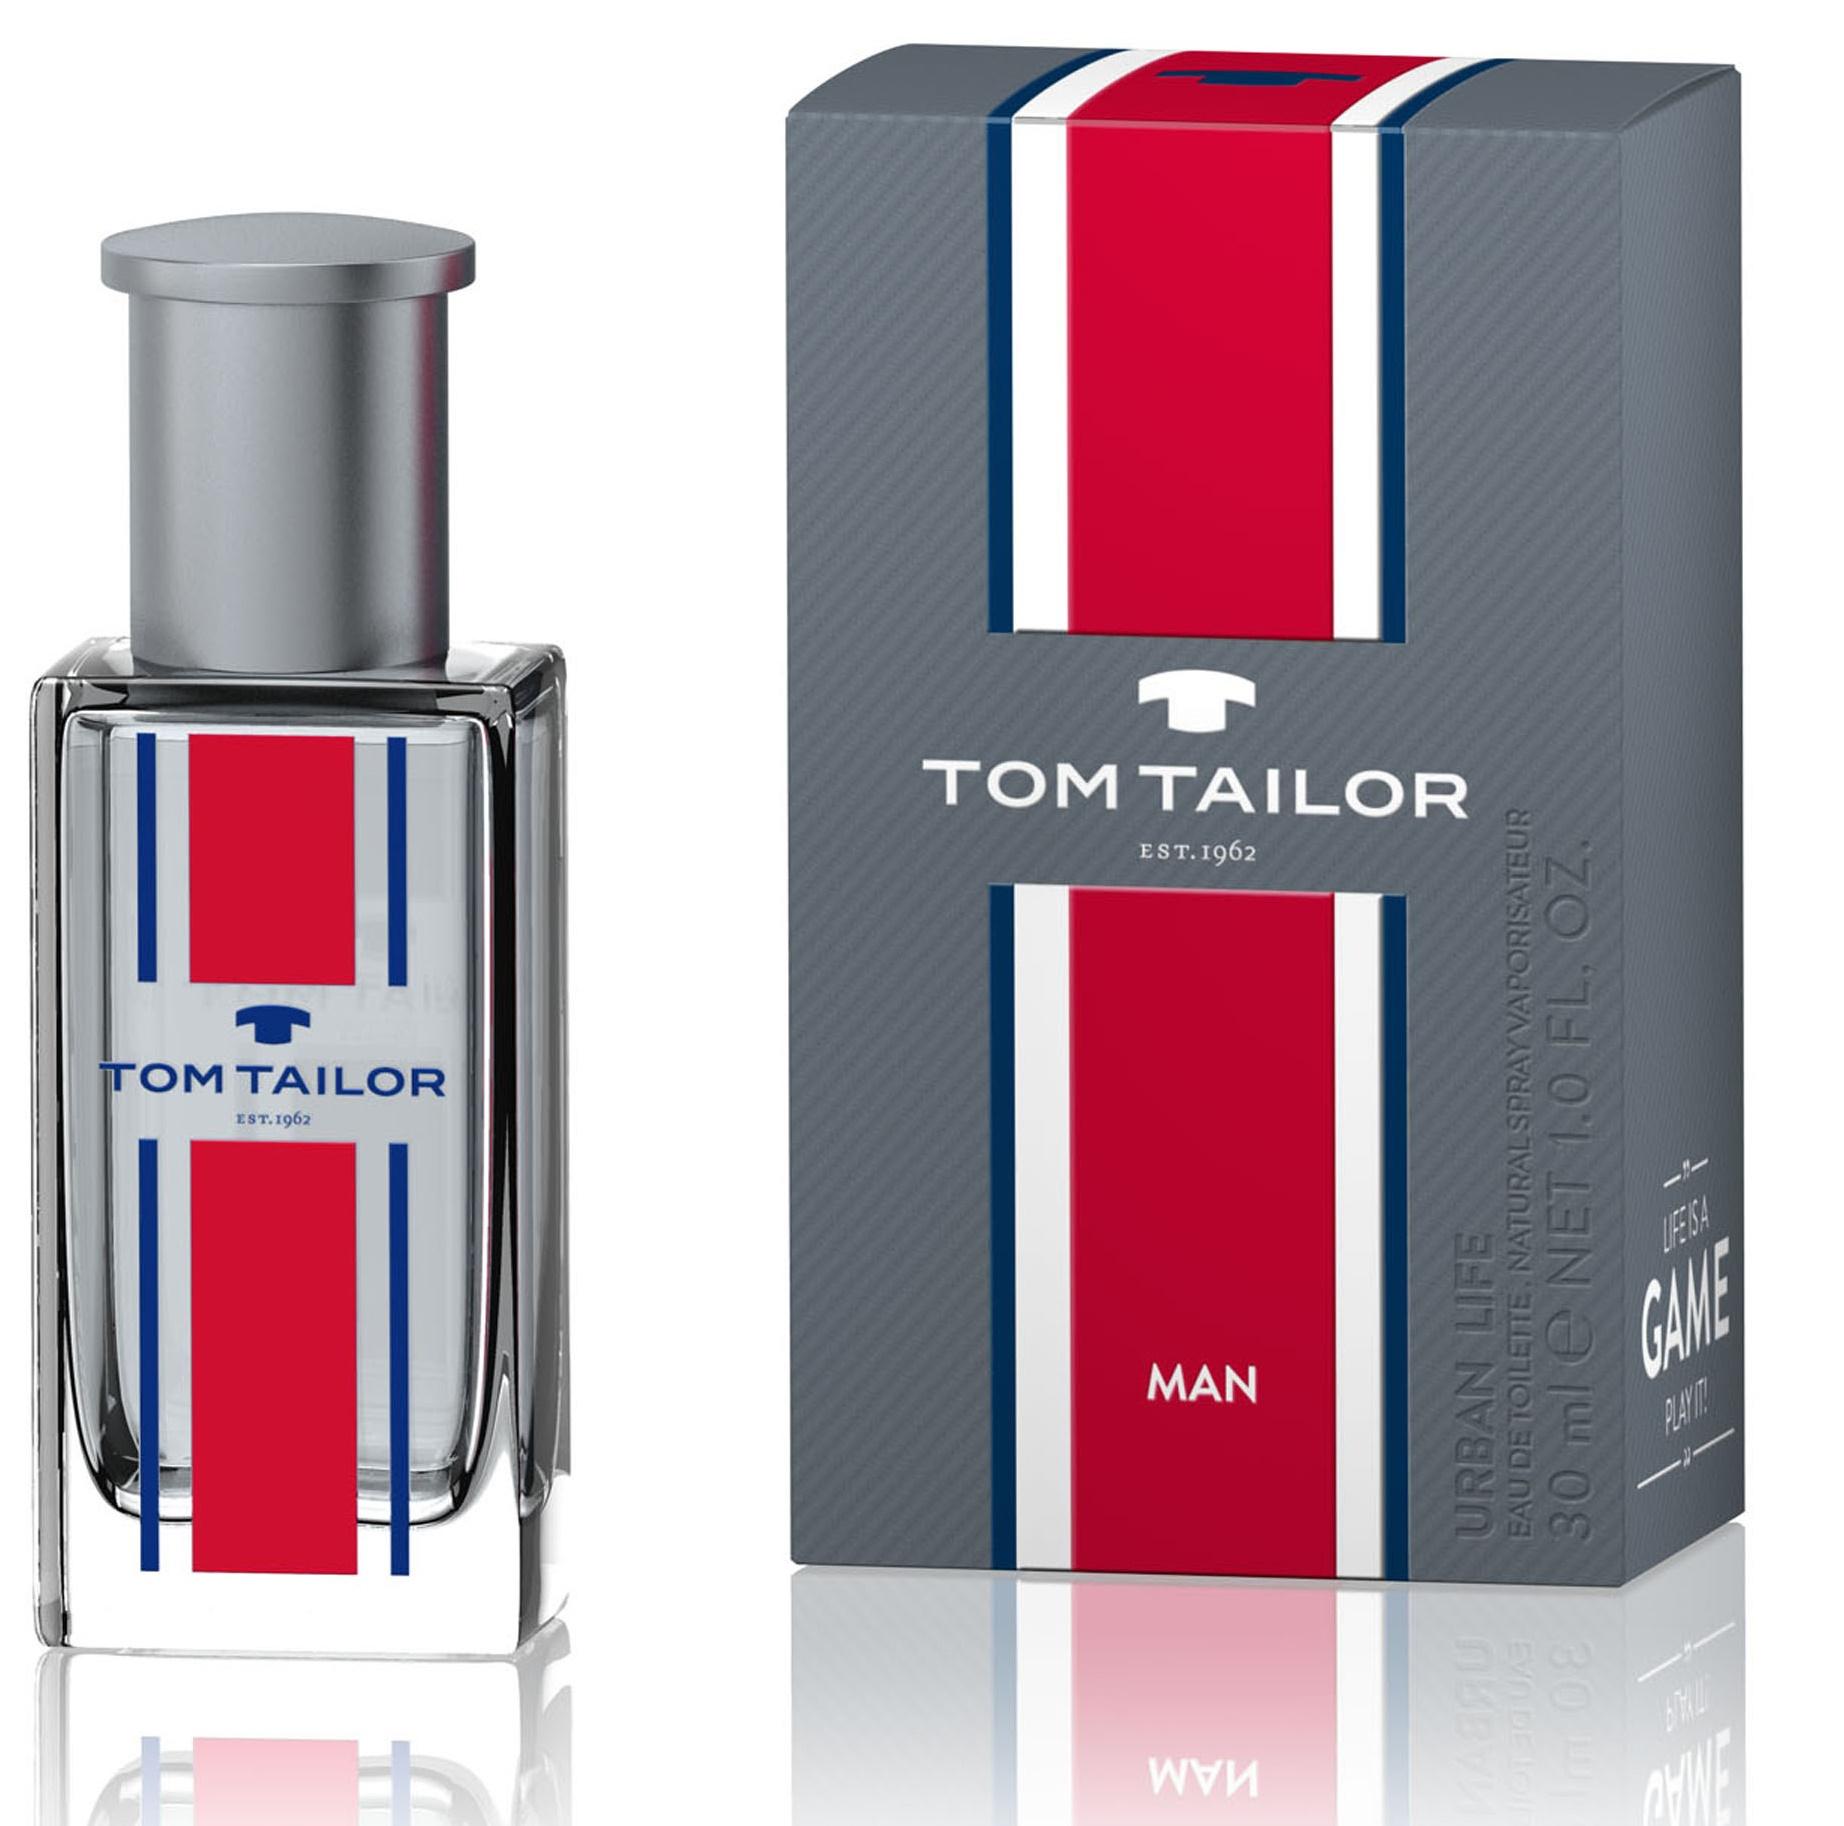 Tom Tailor Urban Life for Man, Toaletní voda, Pánska vôňa, 30ml